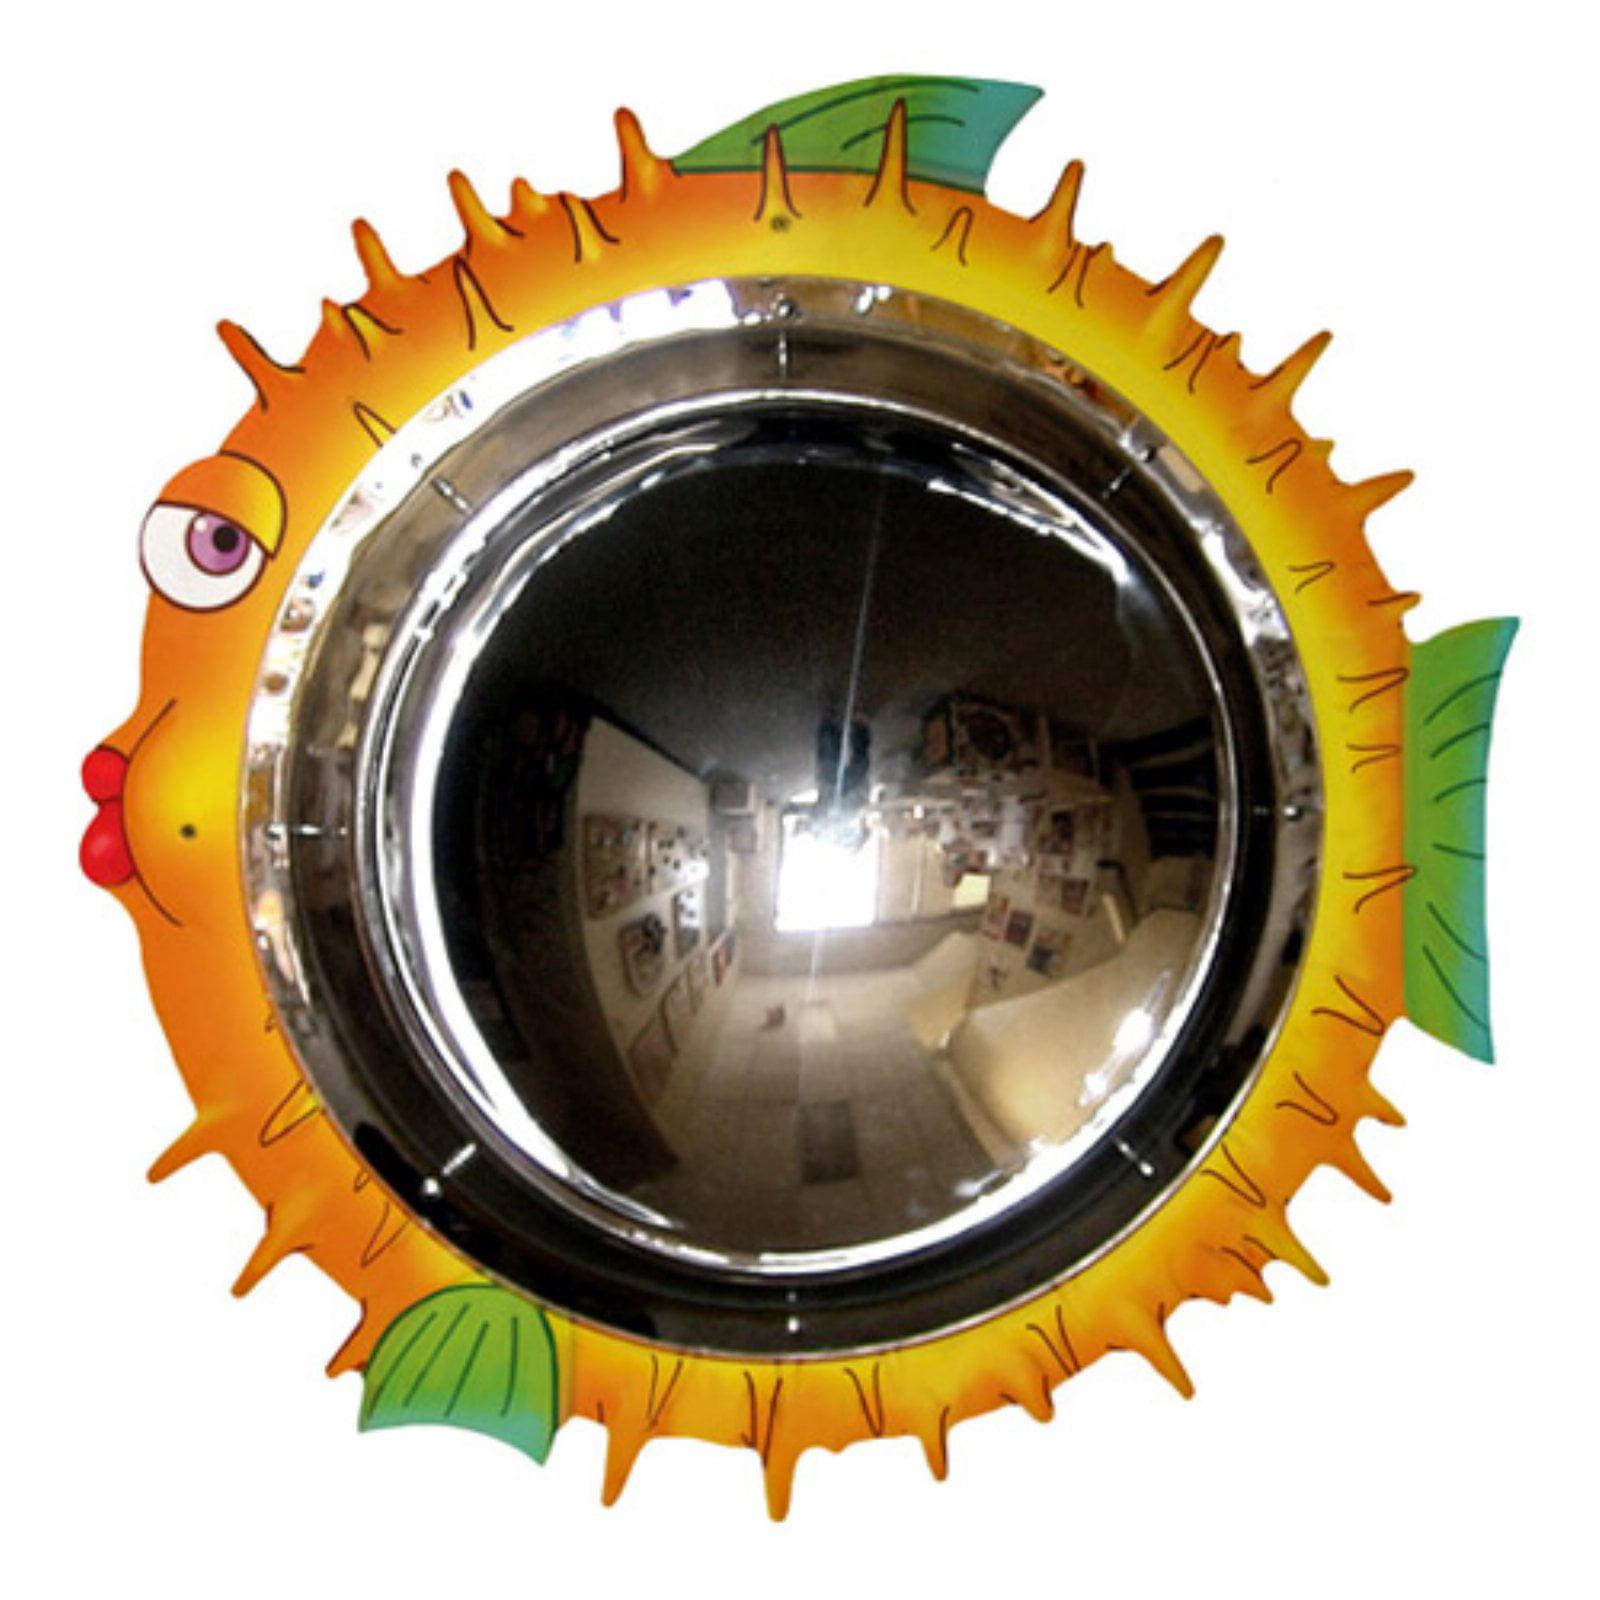 Anatex Blowfish Convex Mirror Wall Panel by Anatex